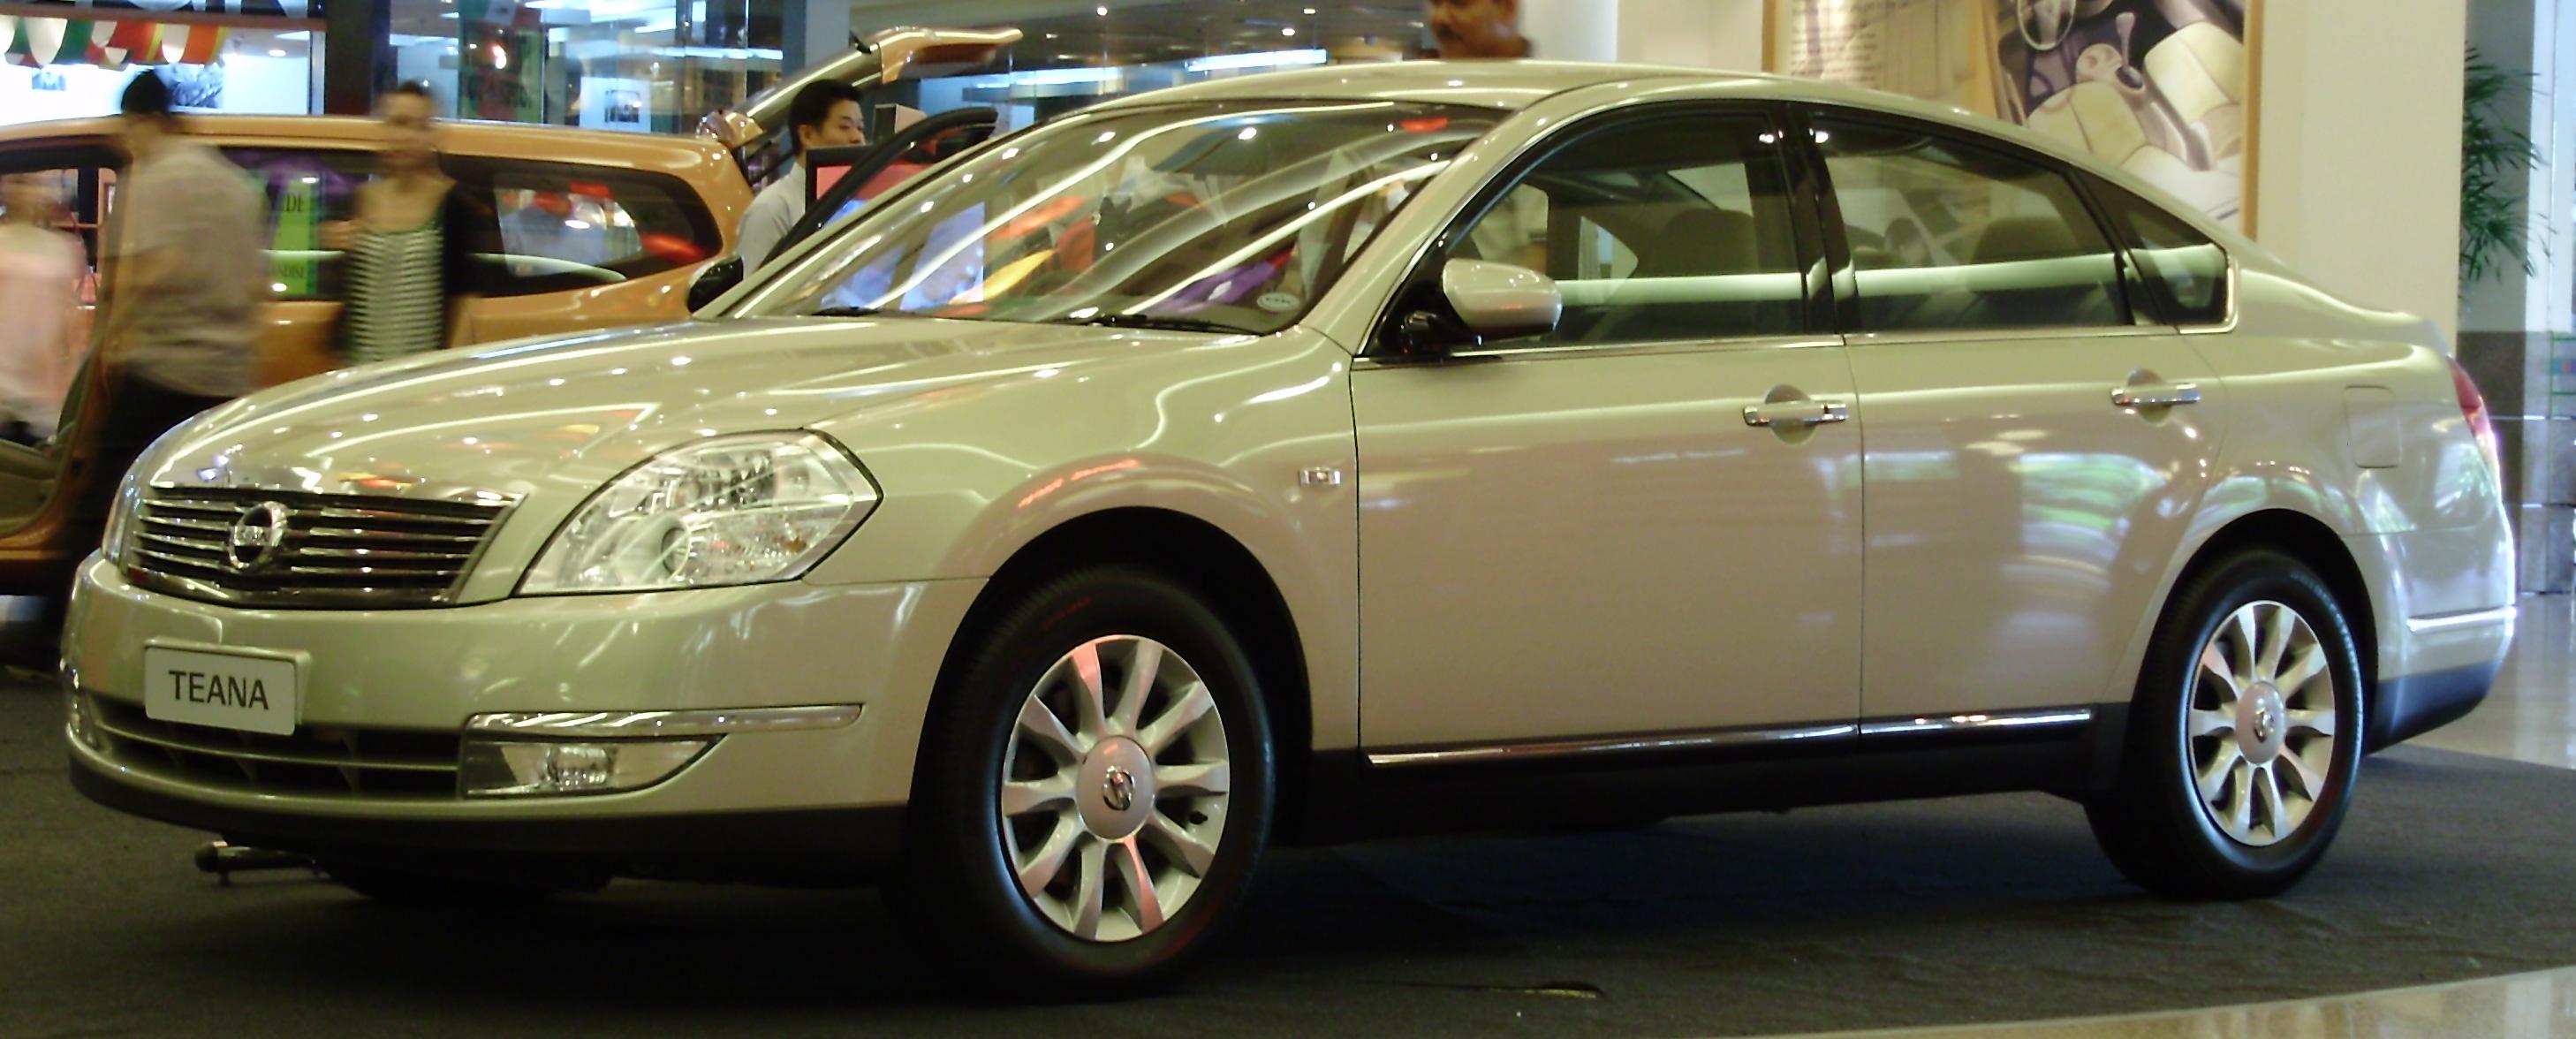 Nissan Teana I Restyling 2006 - 2008 Sedan #6